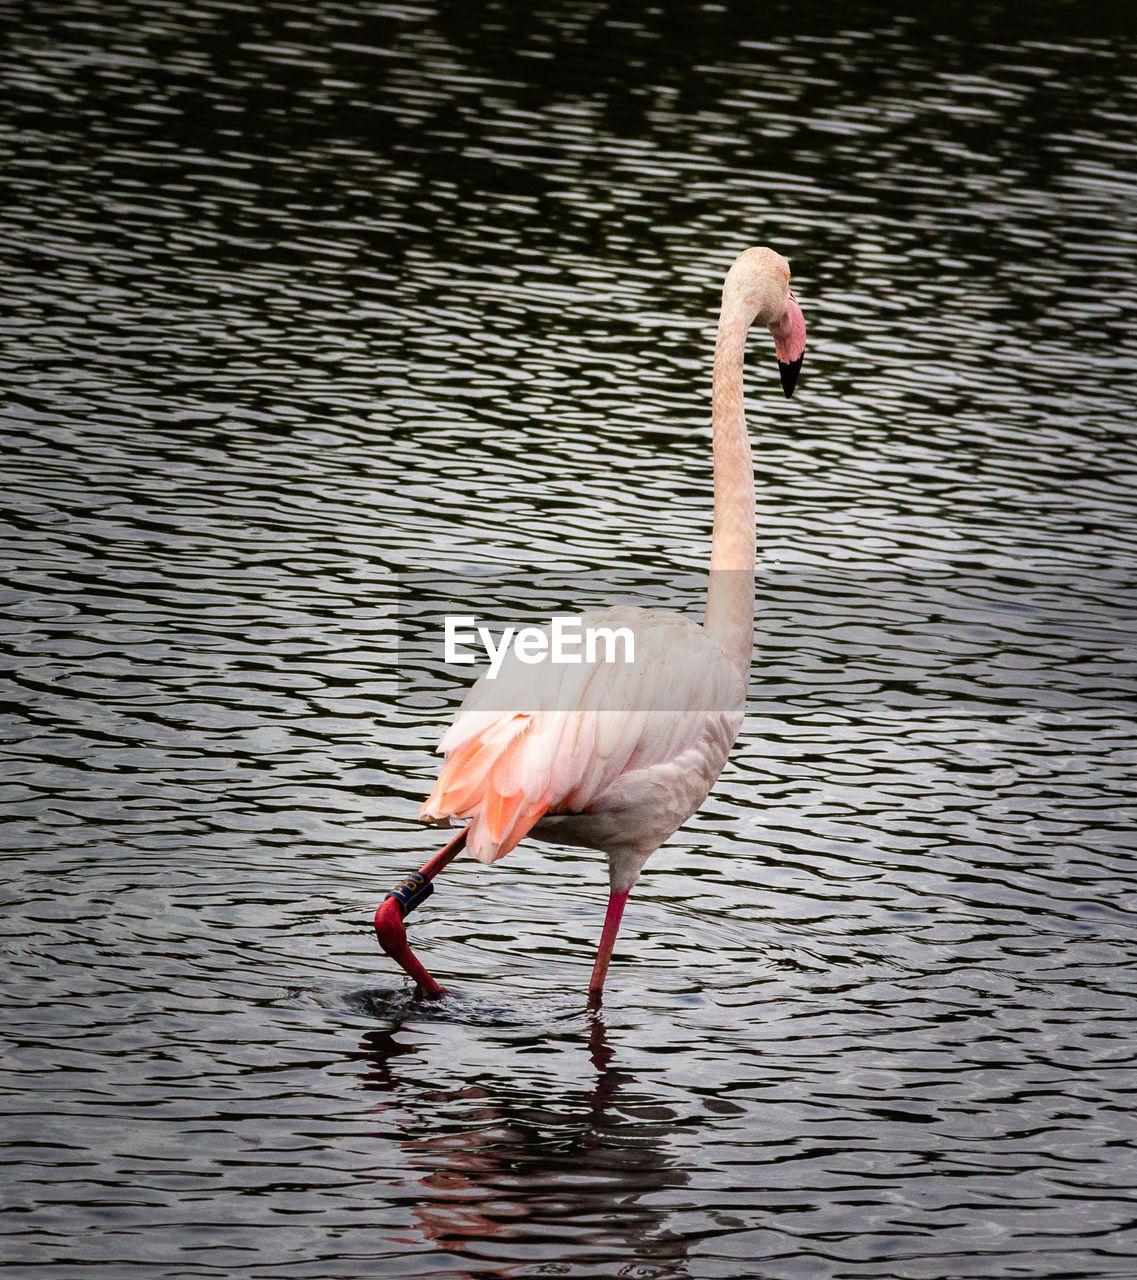 animal themes, animal, animal wildlife, animals in the wild, bird, vertebrate, water, one animal, lake, rippled, day, waterfront, no people, nature, pink color, animal body part, animal neck, outdoors, flamingo